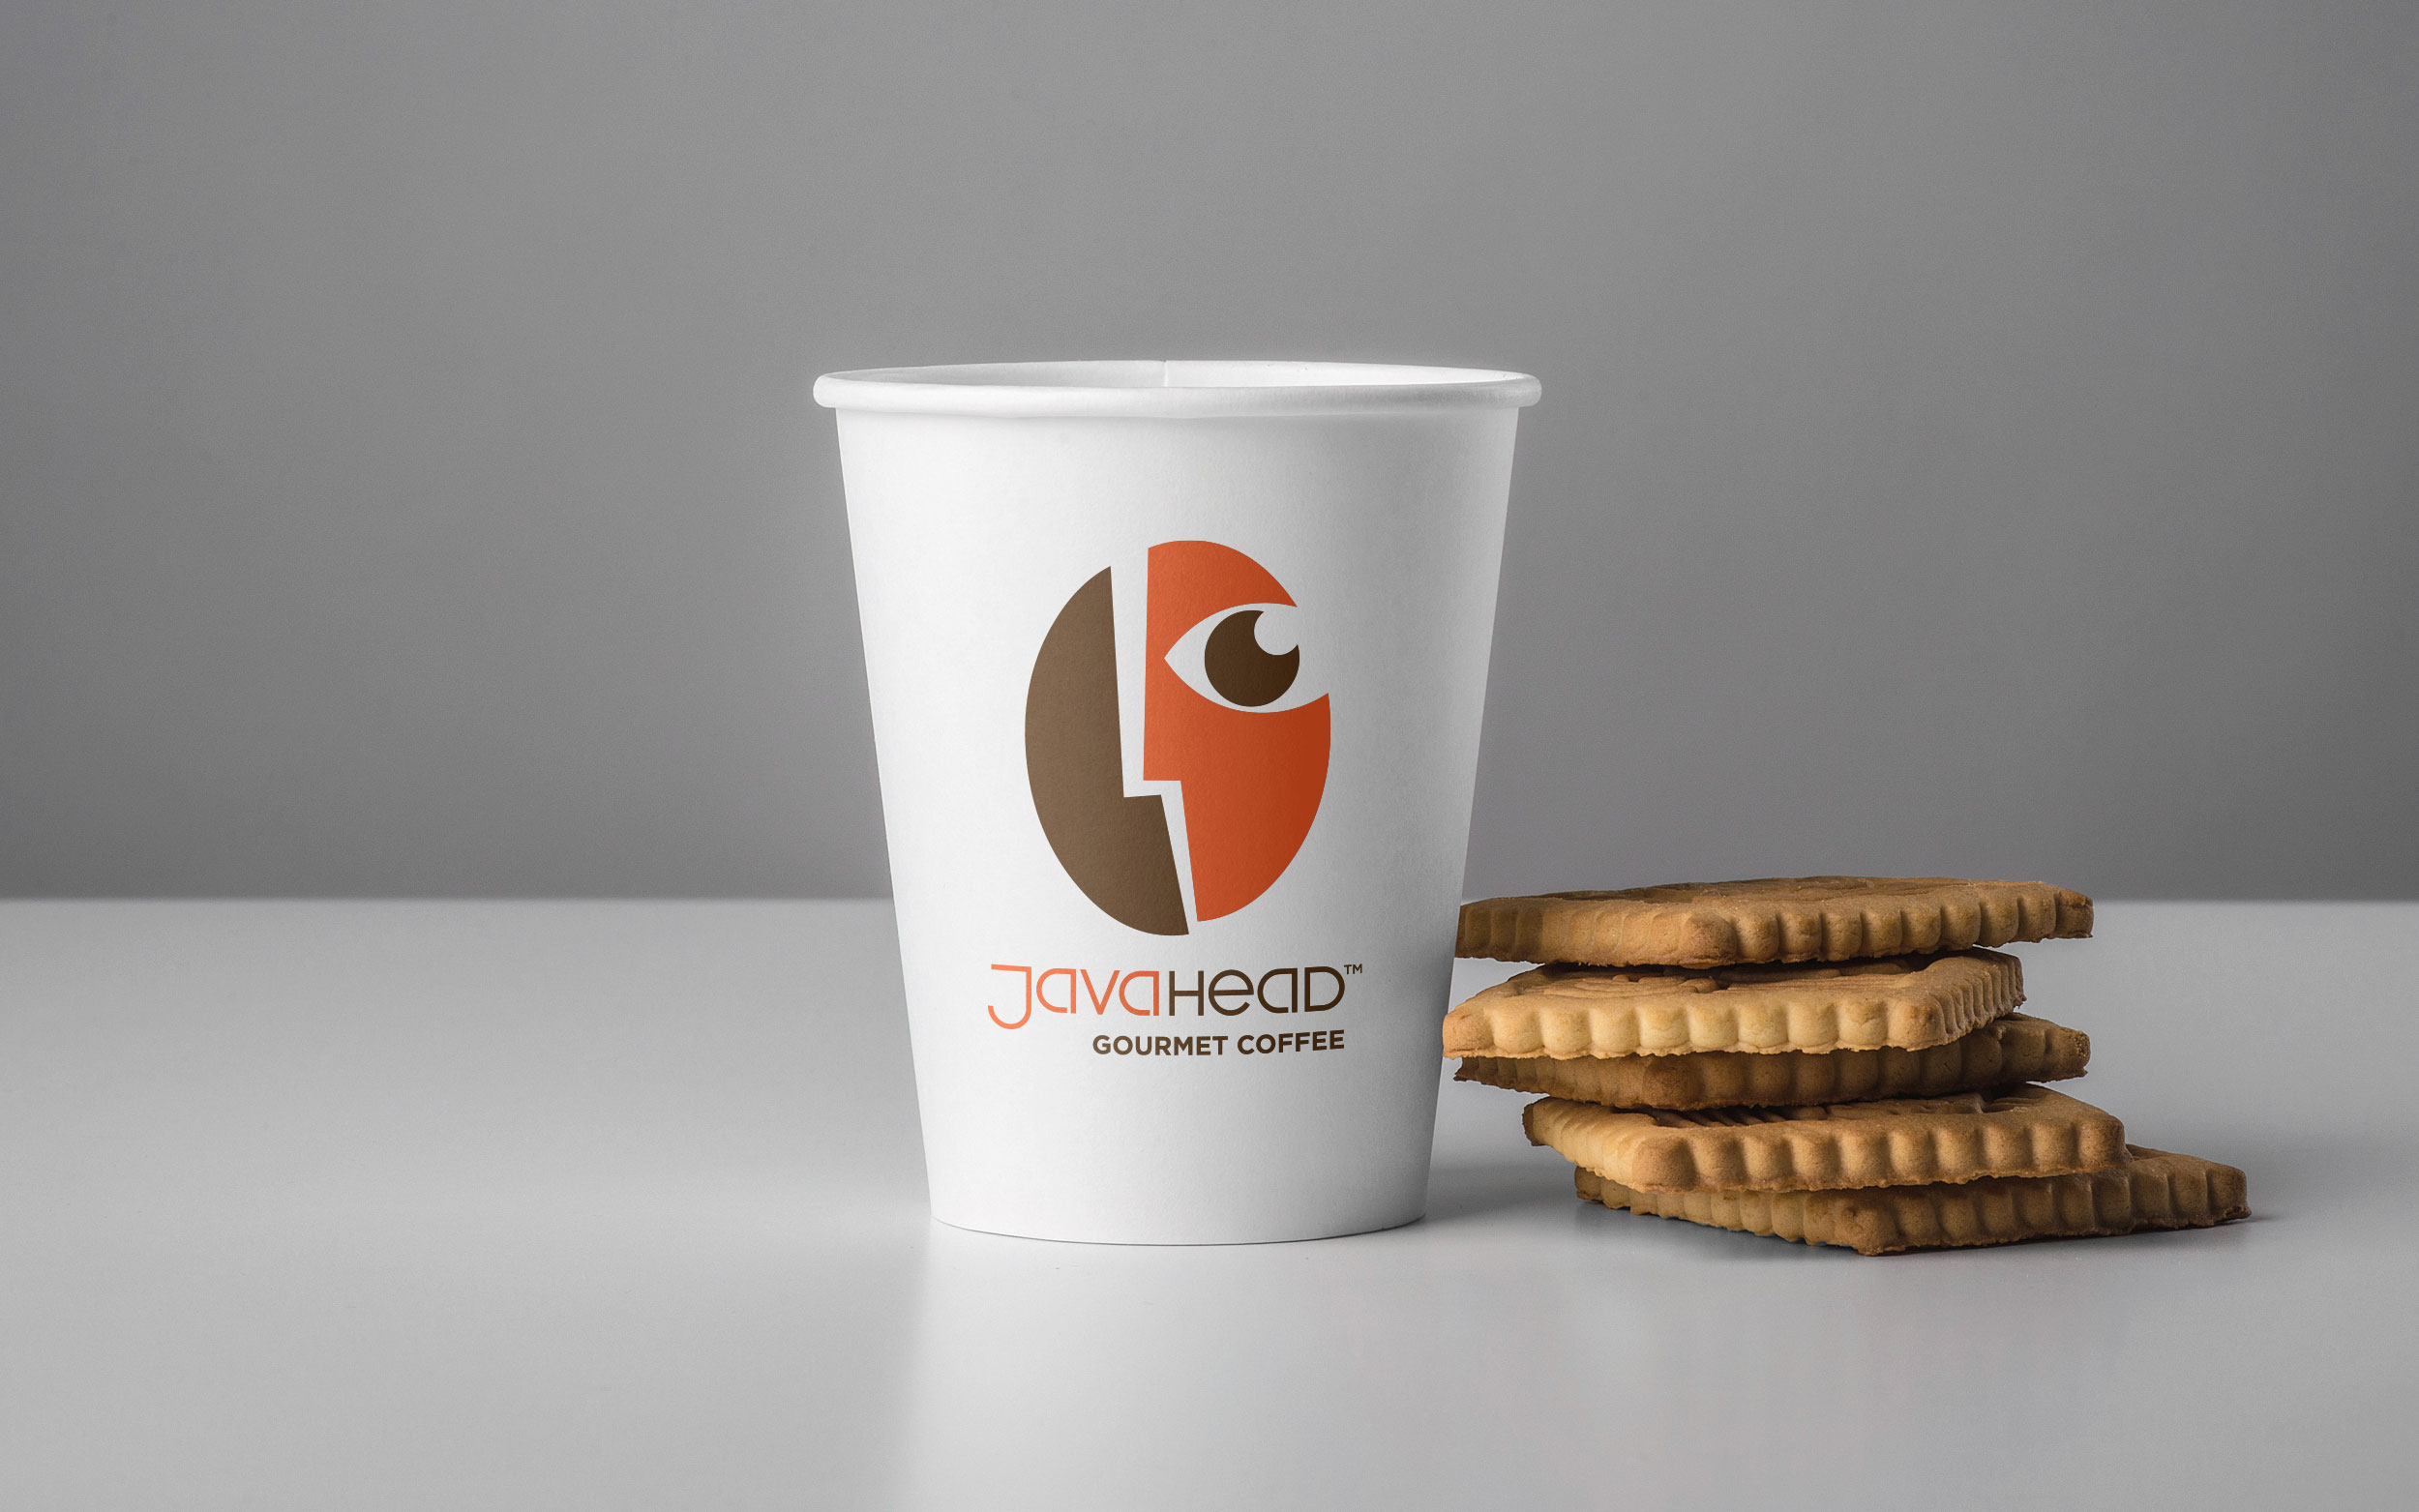 Gourmet Coffee Brand